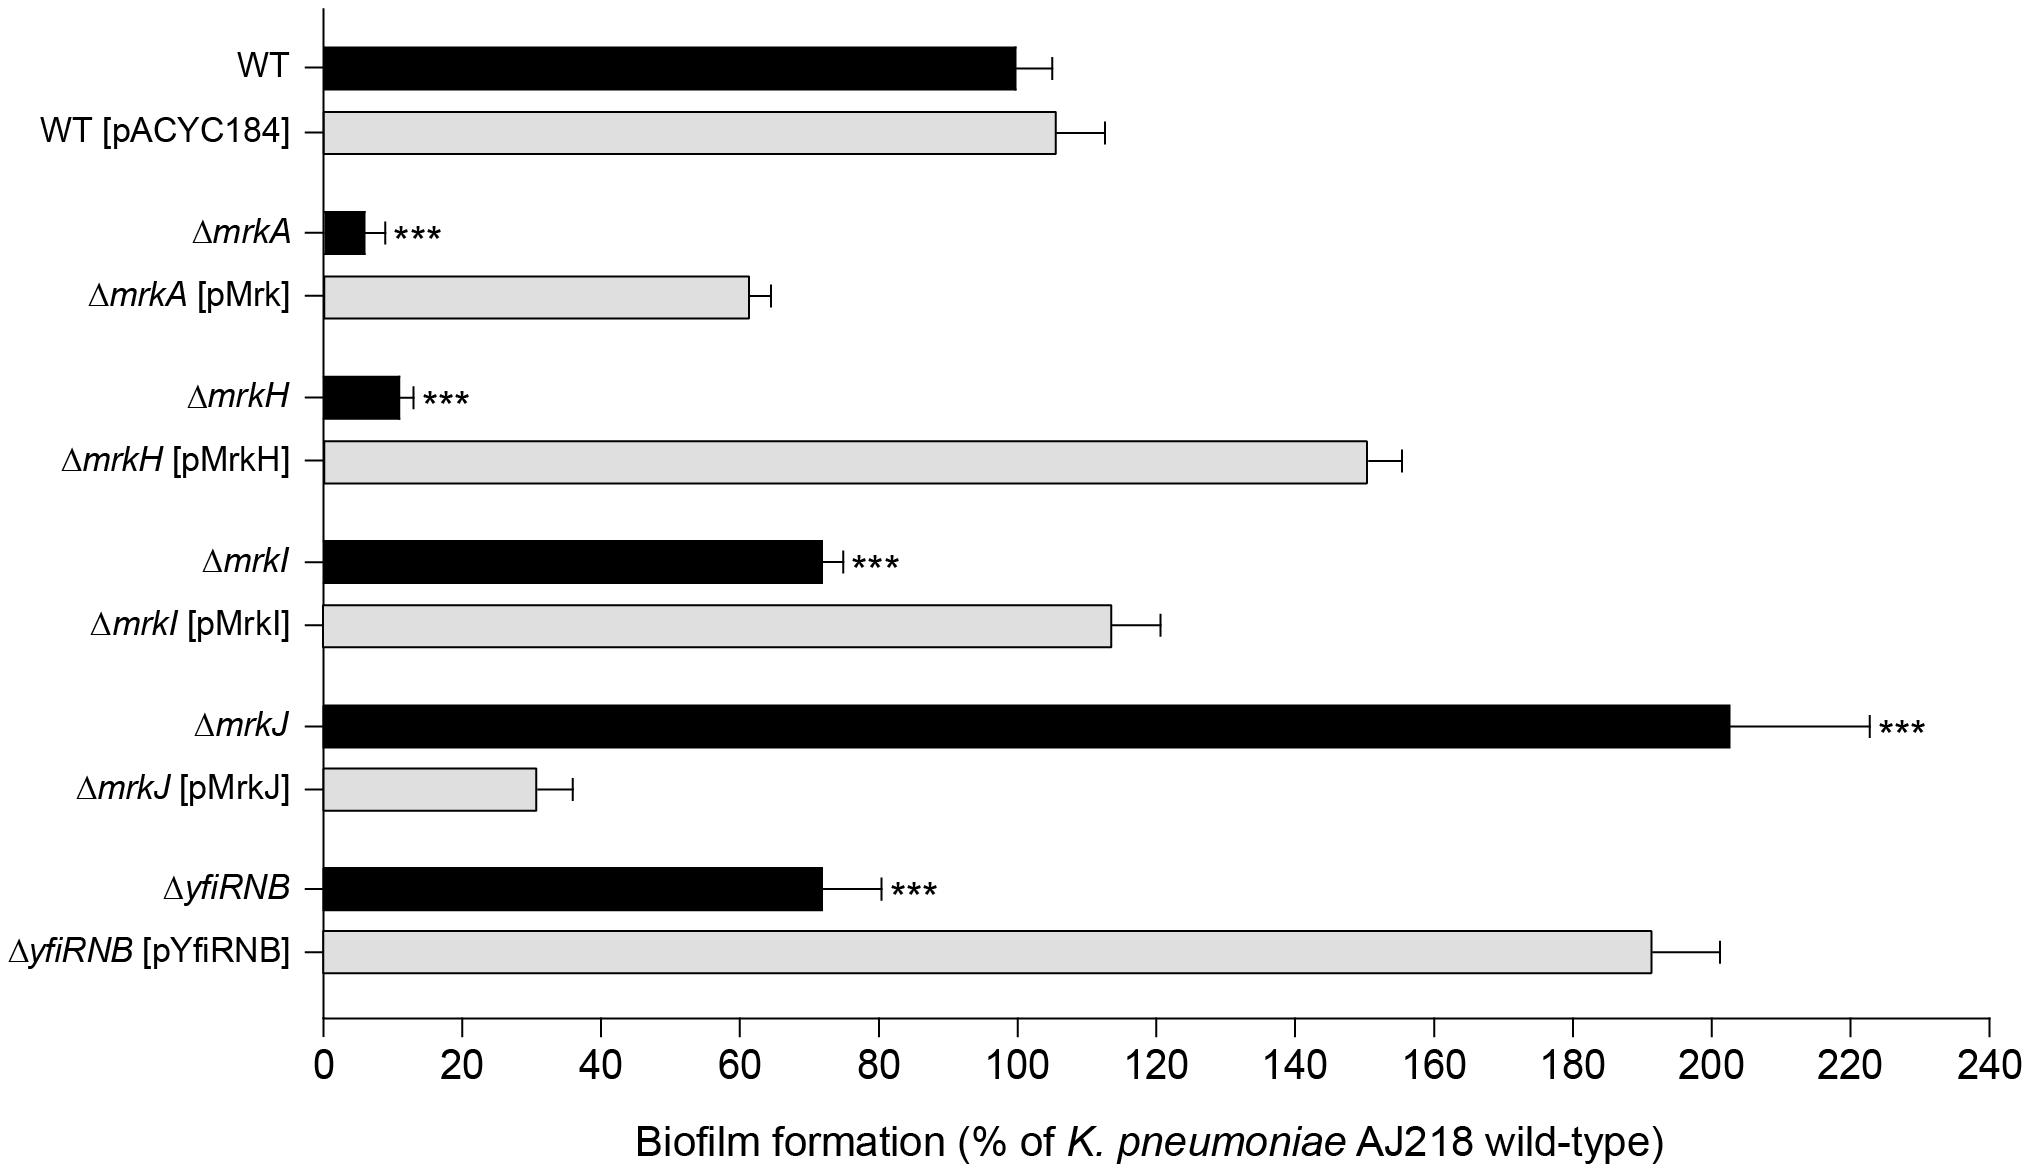 Biofilm formation by <i>K. pneumoniae</i> AJ218.